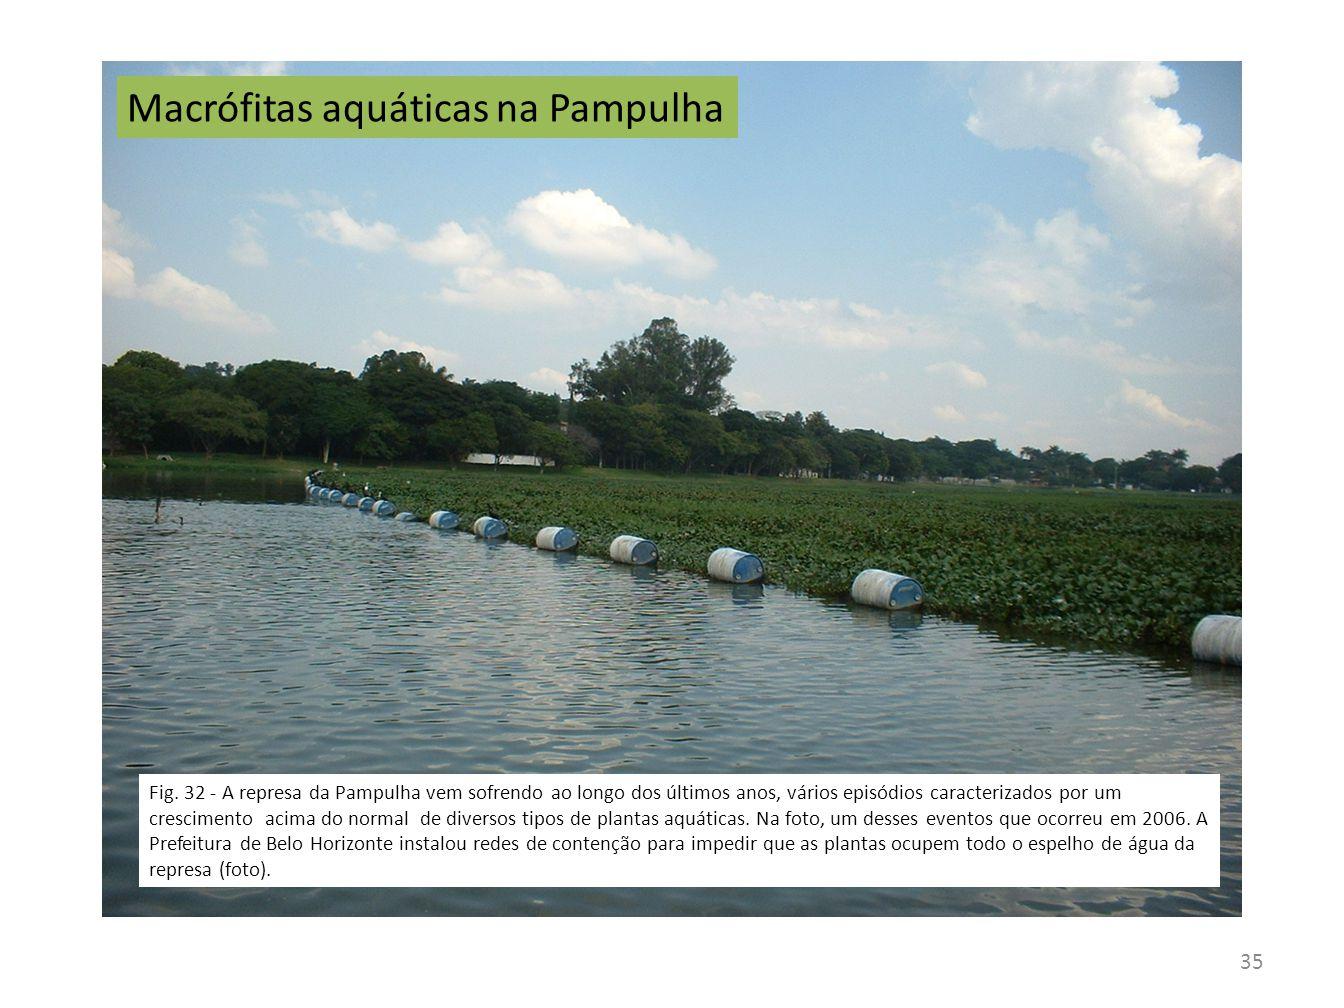 Macrófitas aquáticas na Pampulha